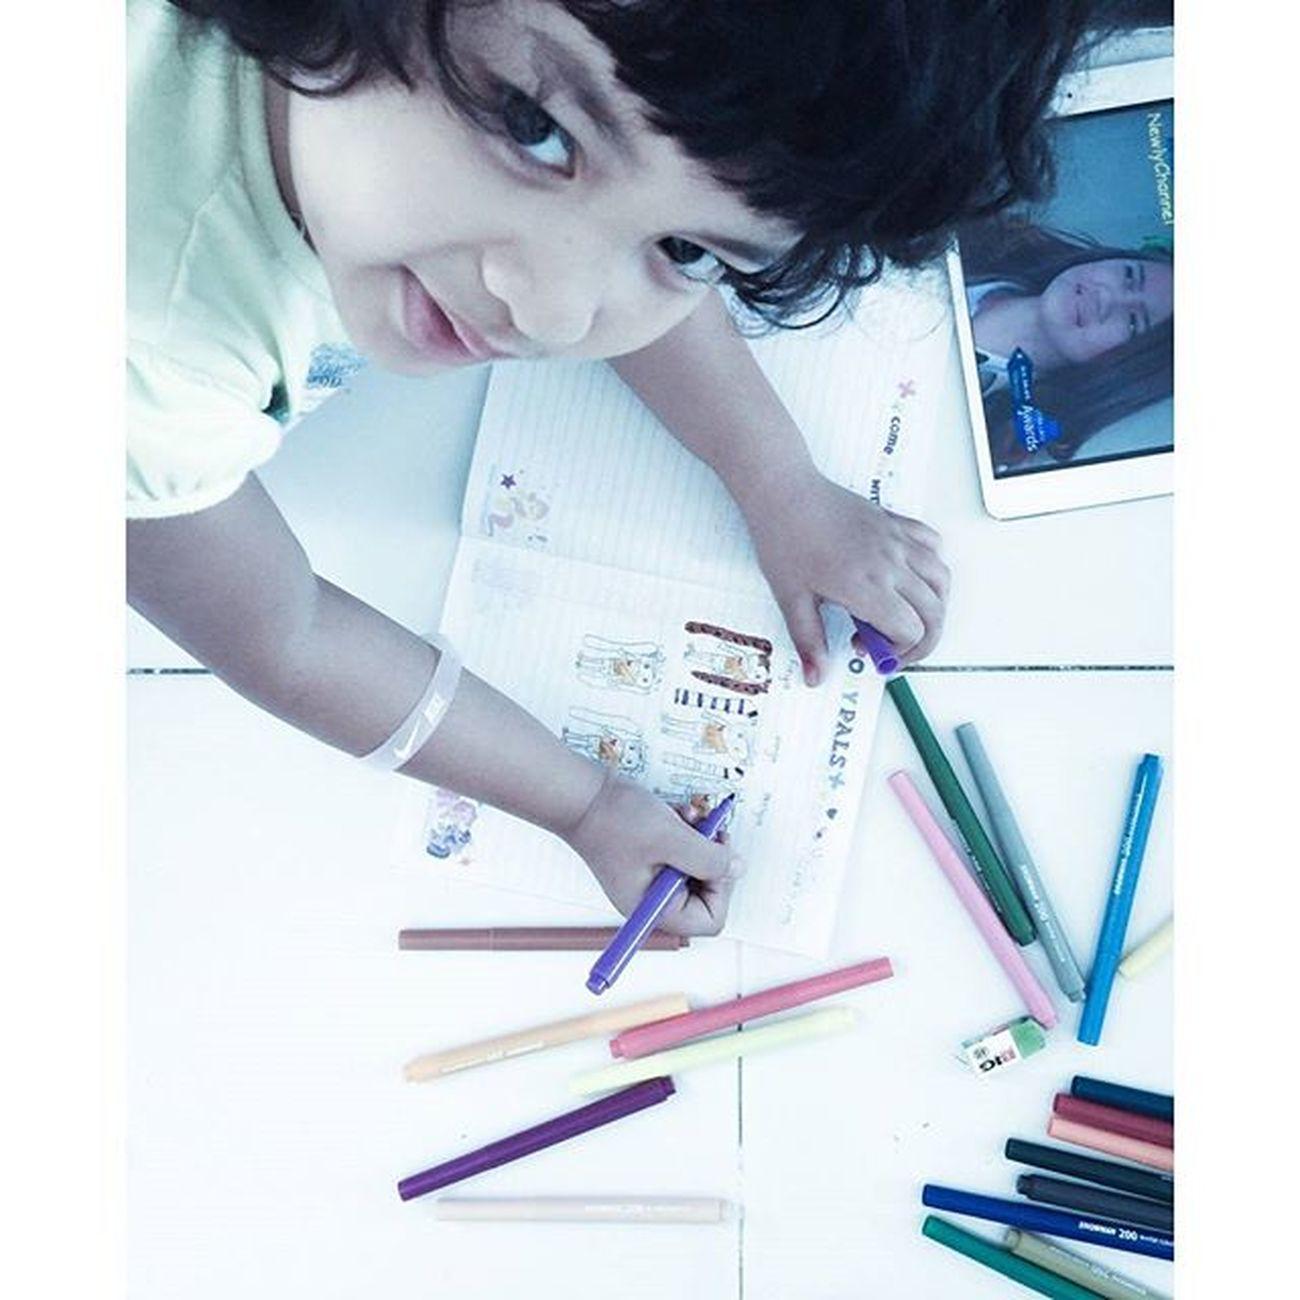 Vanyalodya Momipoklittlegirl Superedgykid Kidsartist hasiljepretanoomajaib Capture by @andhiquarzia